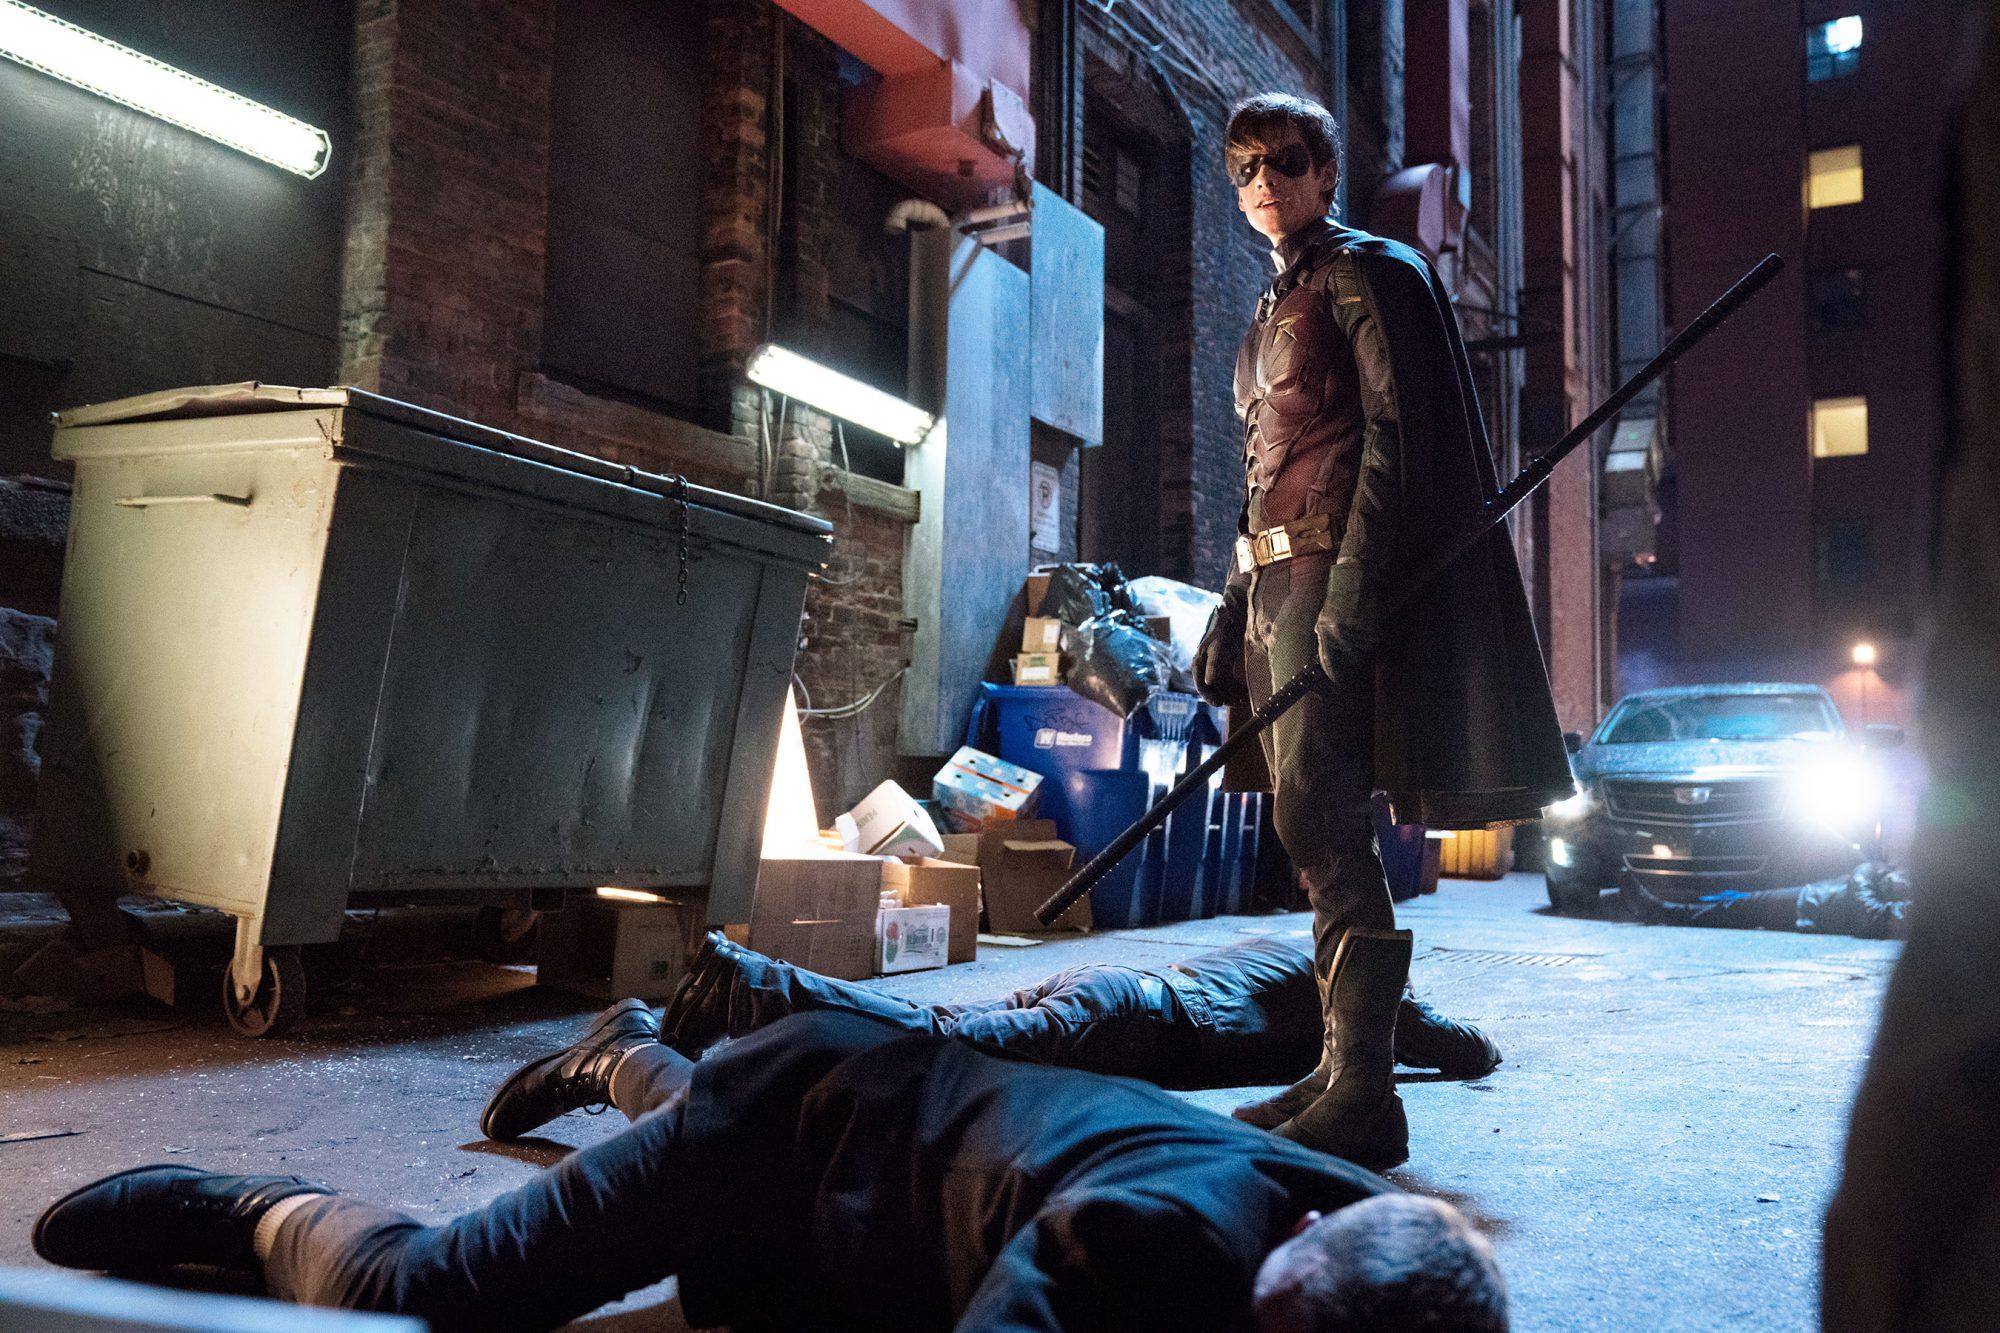 Superhero saving someone on the floor in dark back alley